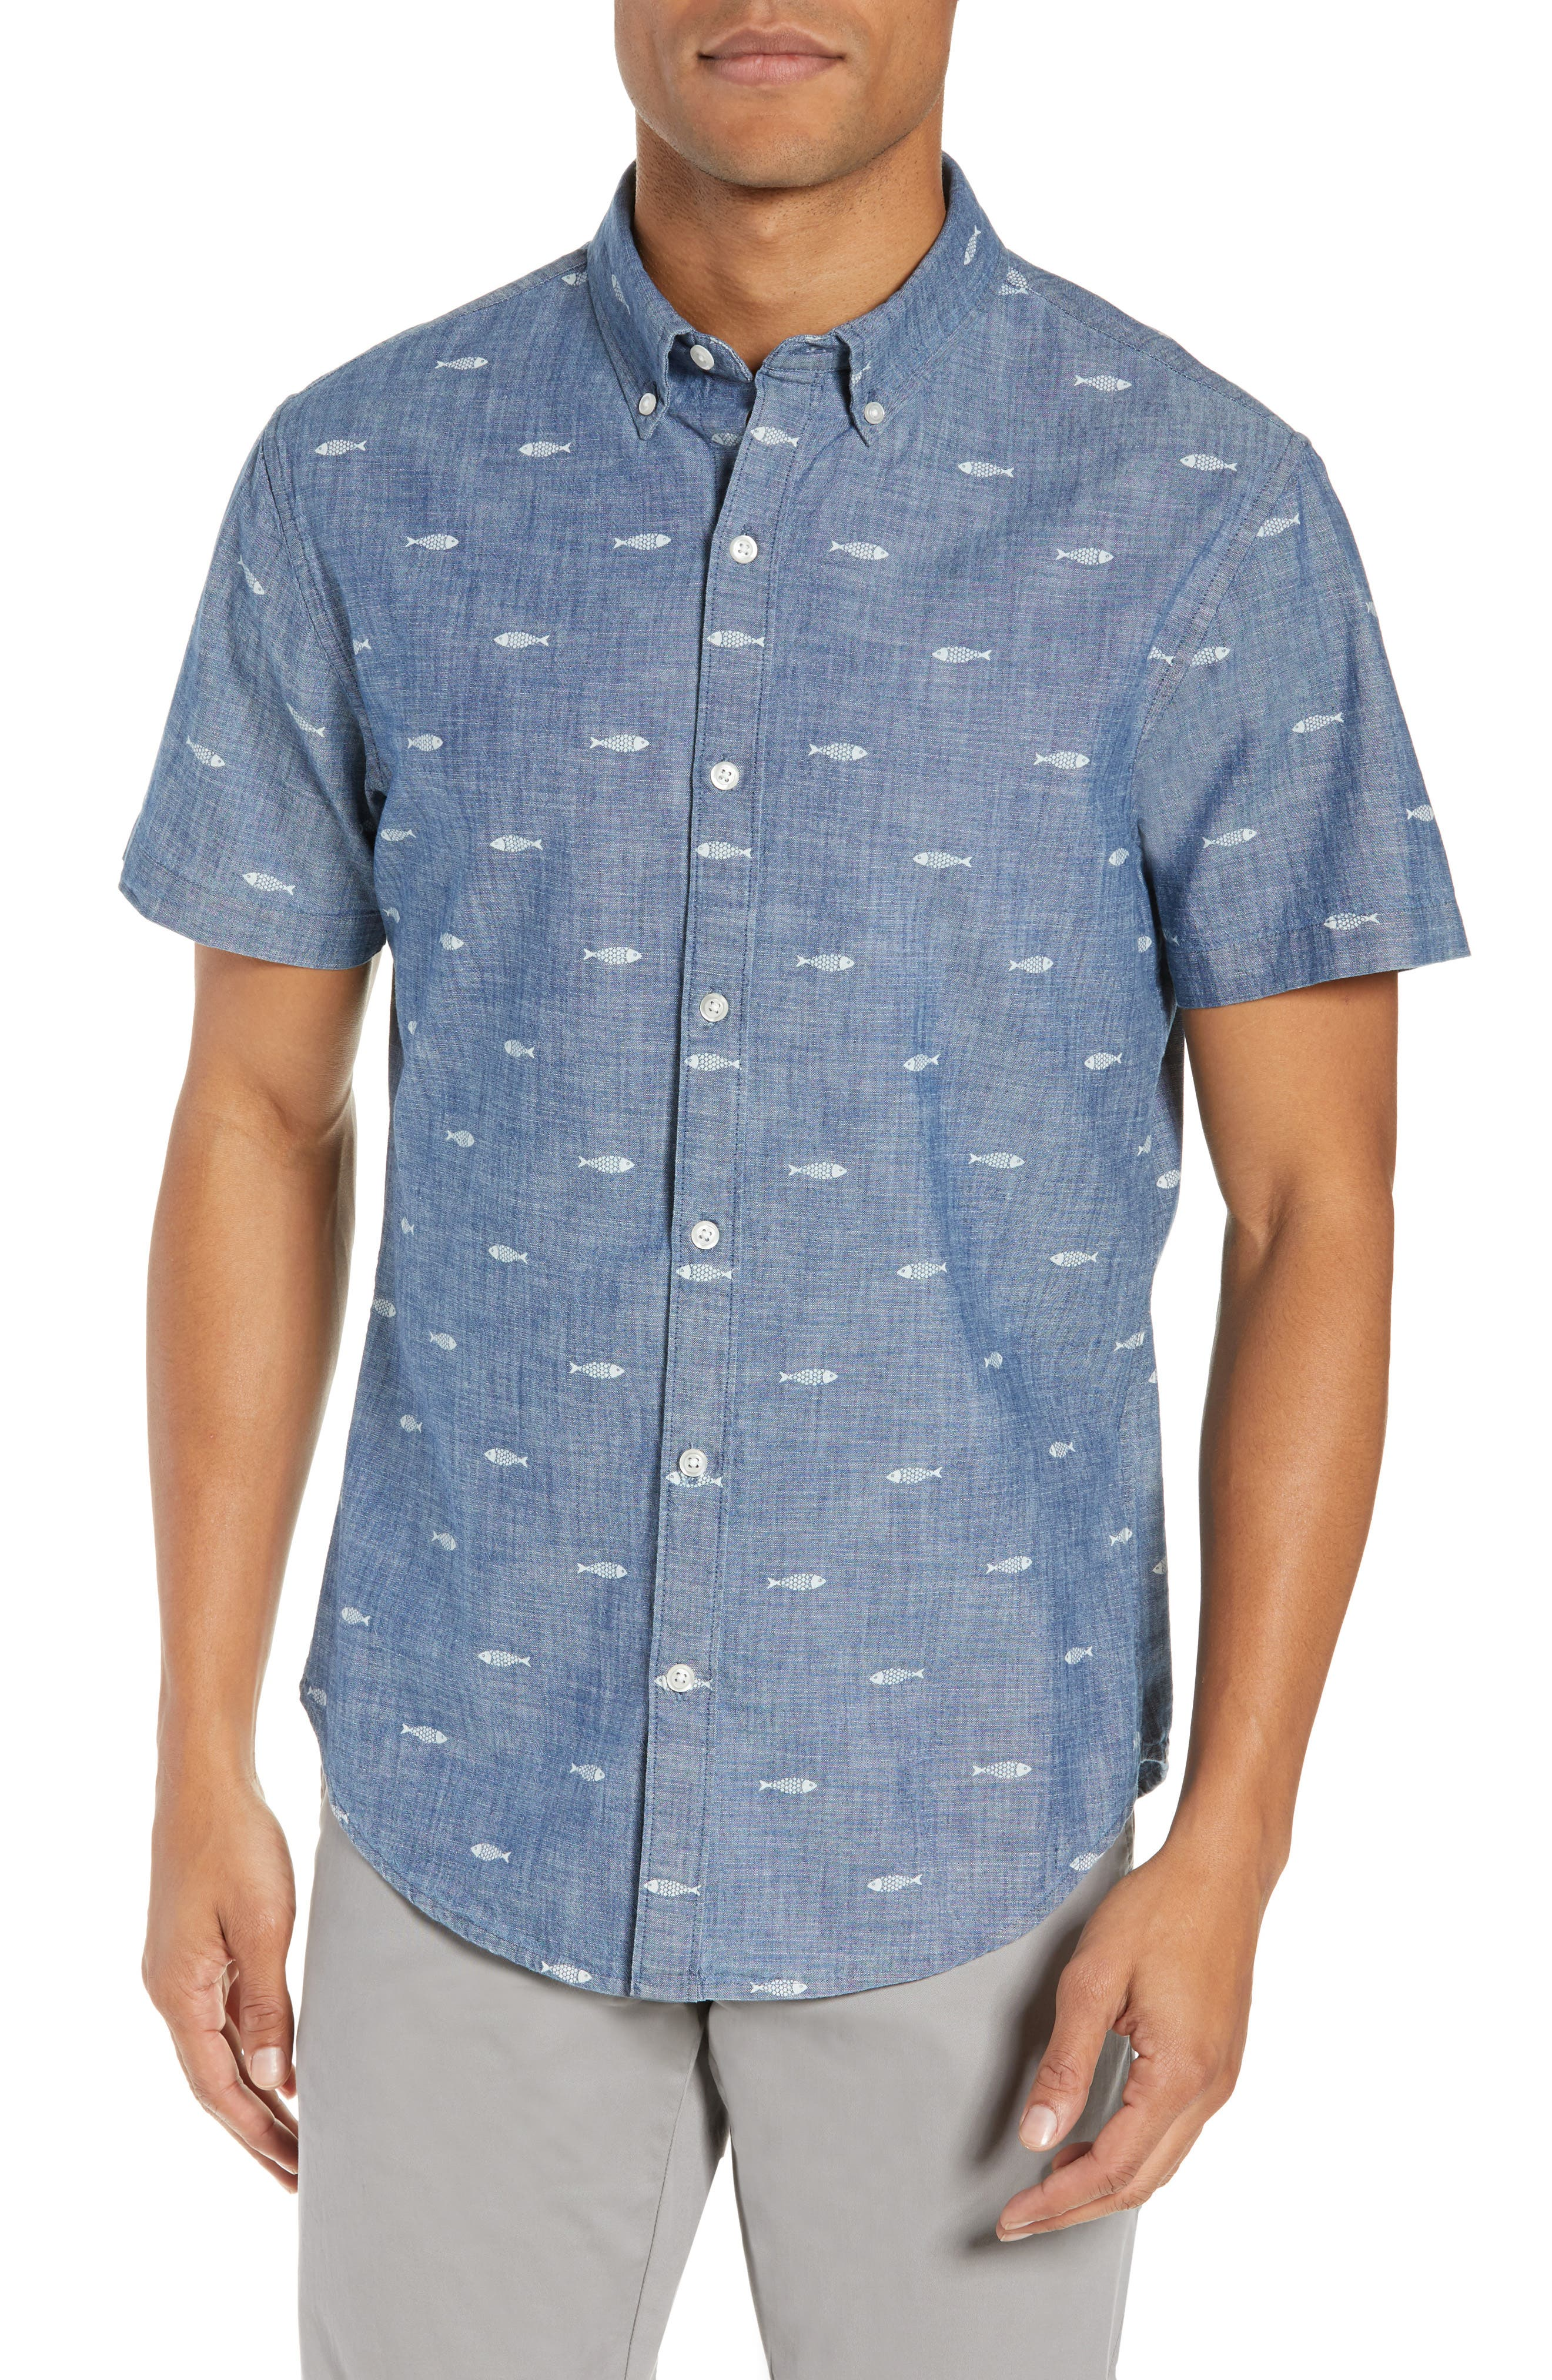 BONOBOS, Riviera Slim Fit Print Sport Shirt, Main thumbnail 1, color, CHAMBRAY SARDEEN SCATTER